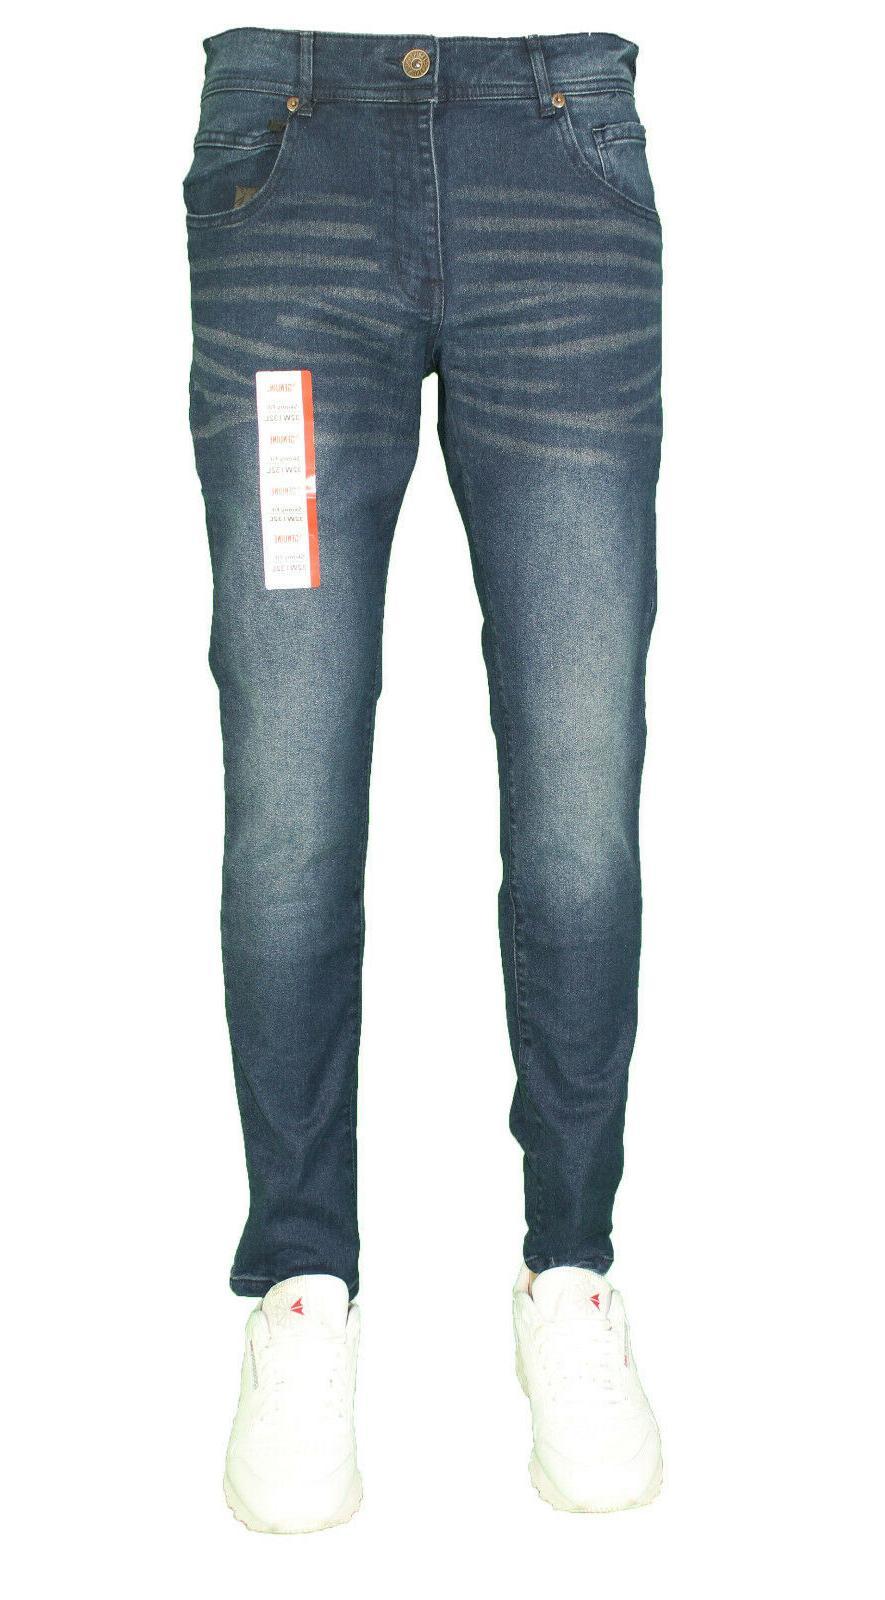 Men Slim Fit Slim Skinny Casual Designer Jeans